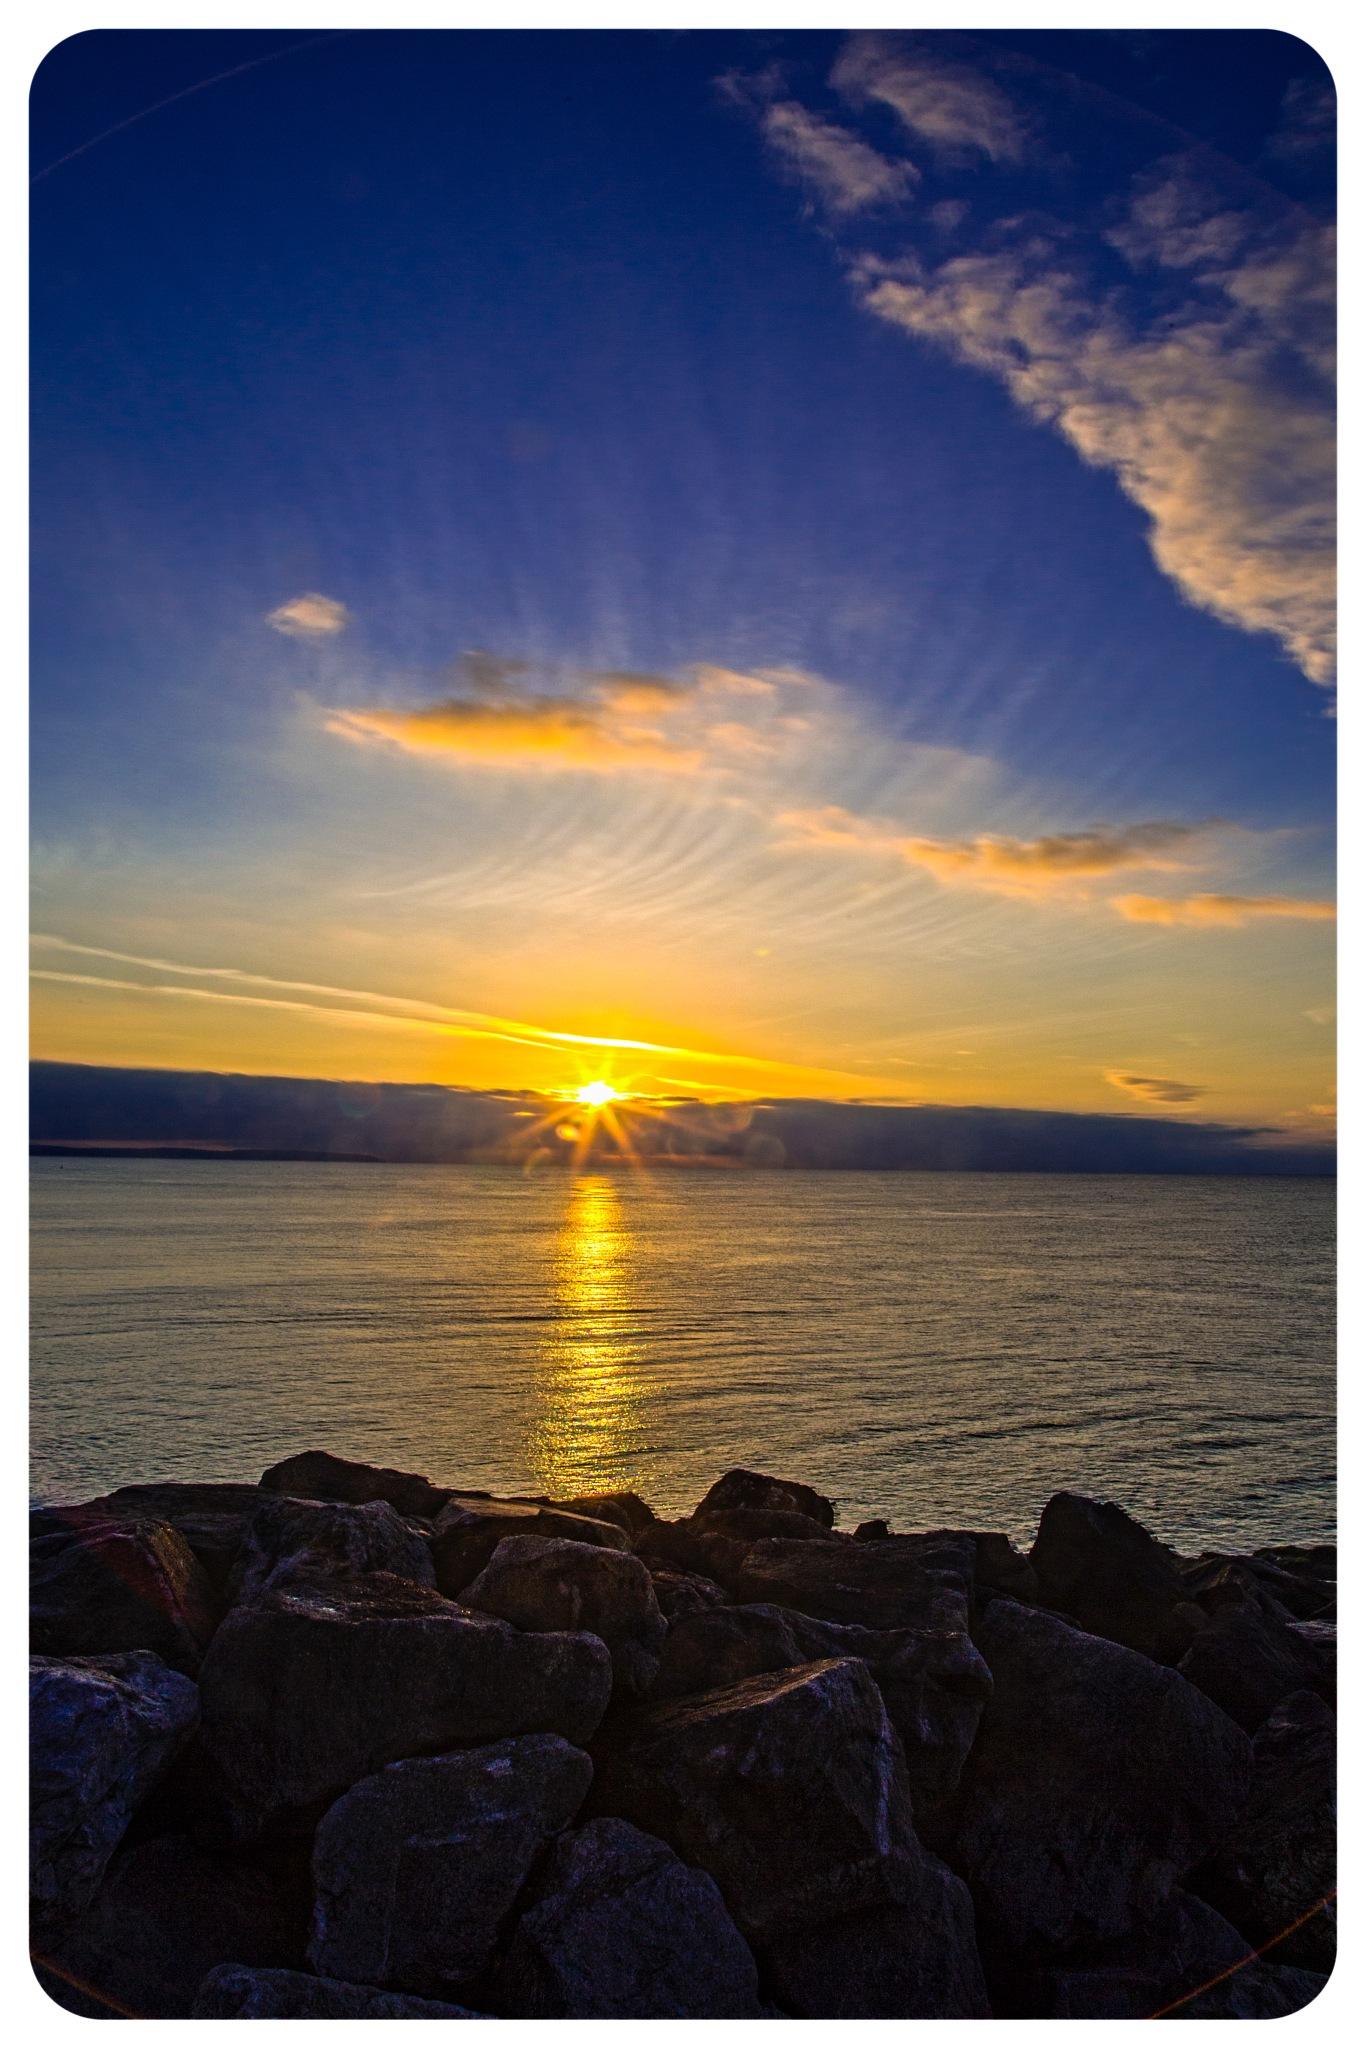 sunrise 1 by eddie.powell.9809